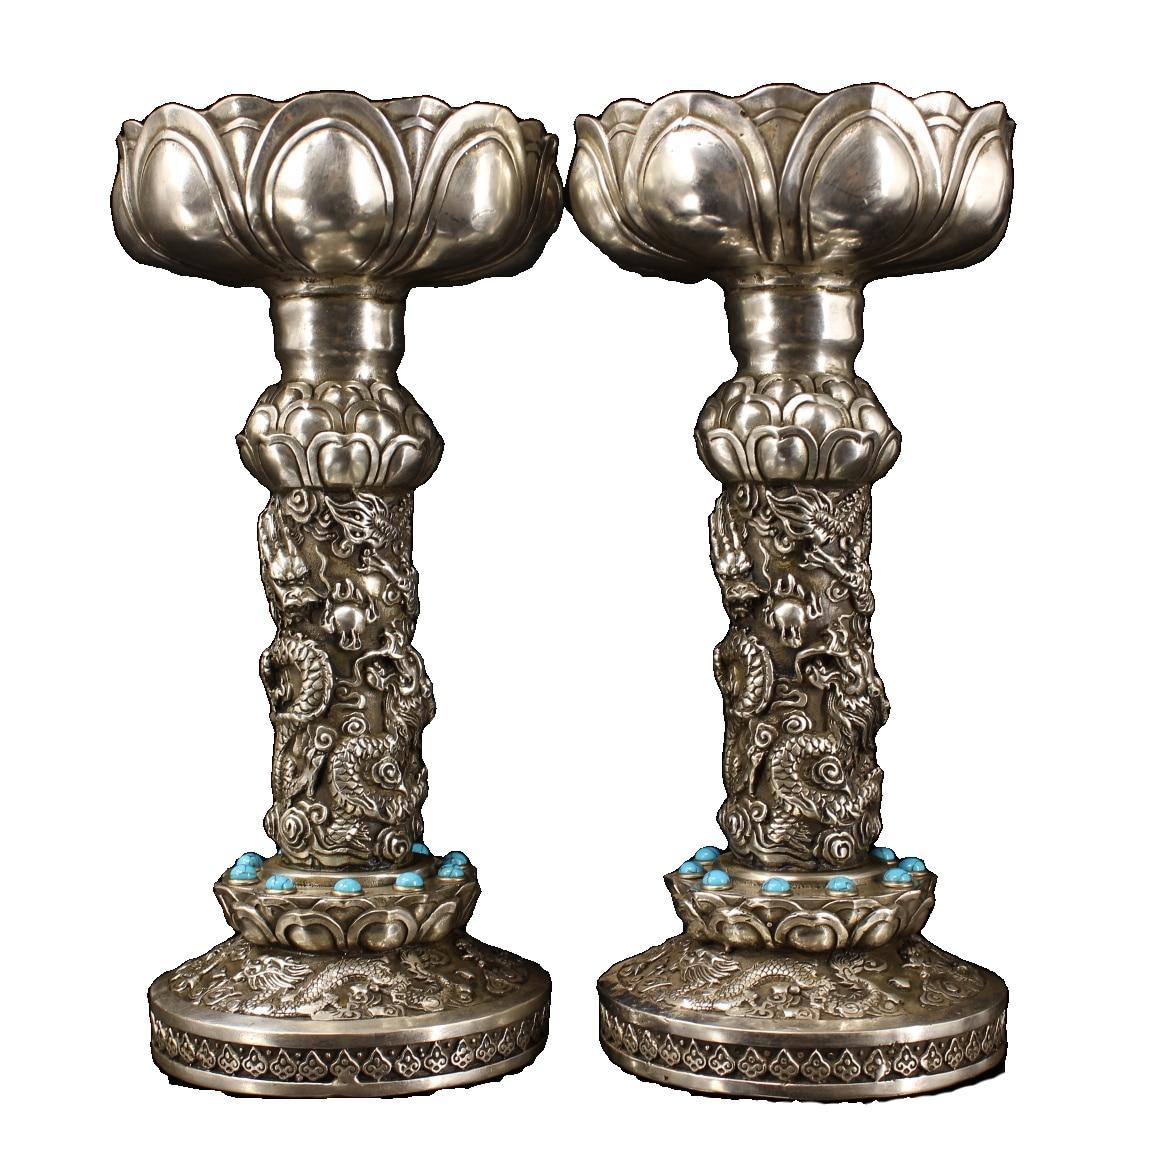 Laojunlu زوج من النحاس النقي ، كل اليدوية ، جوهرة مجموعة ، مذهب الفضة ، التنين سحب الجداول العتيقة البرونزية تحفة